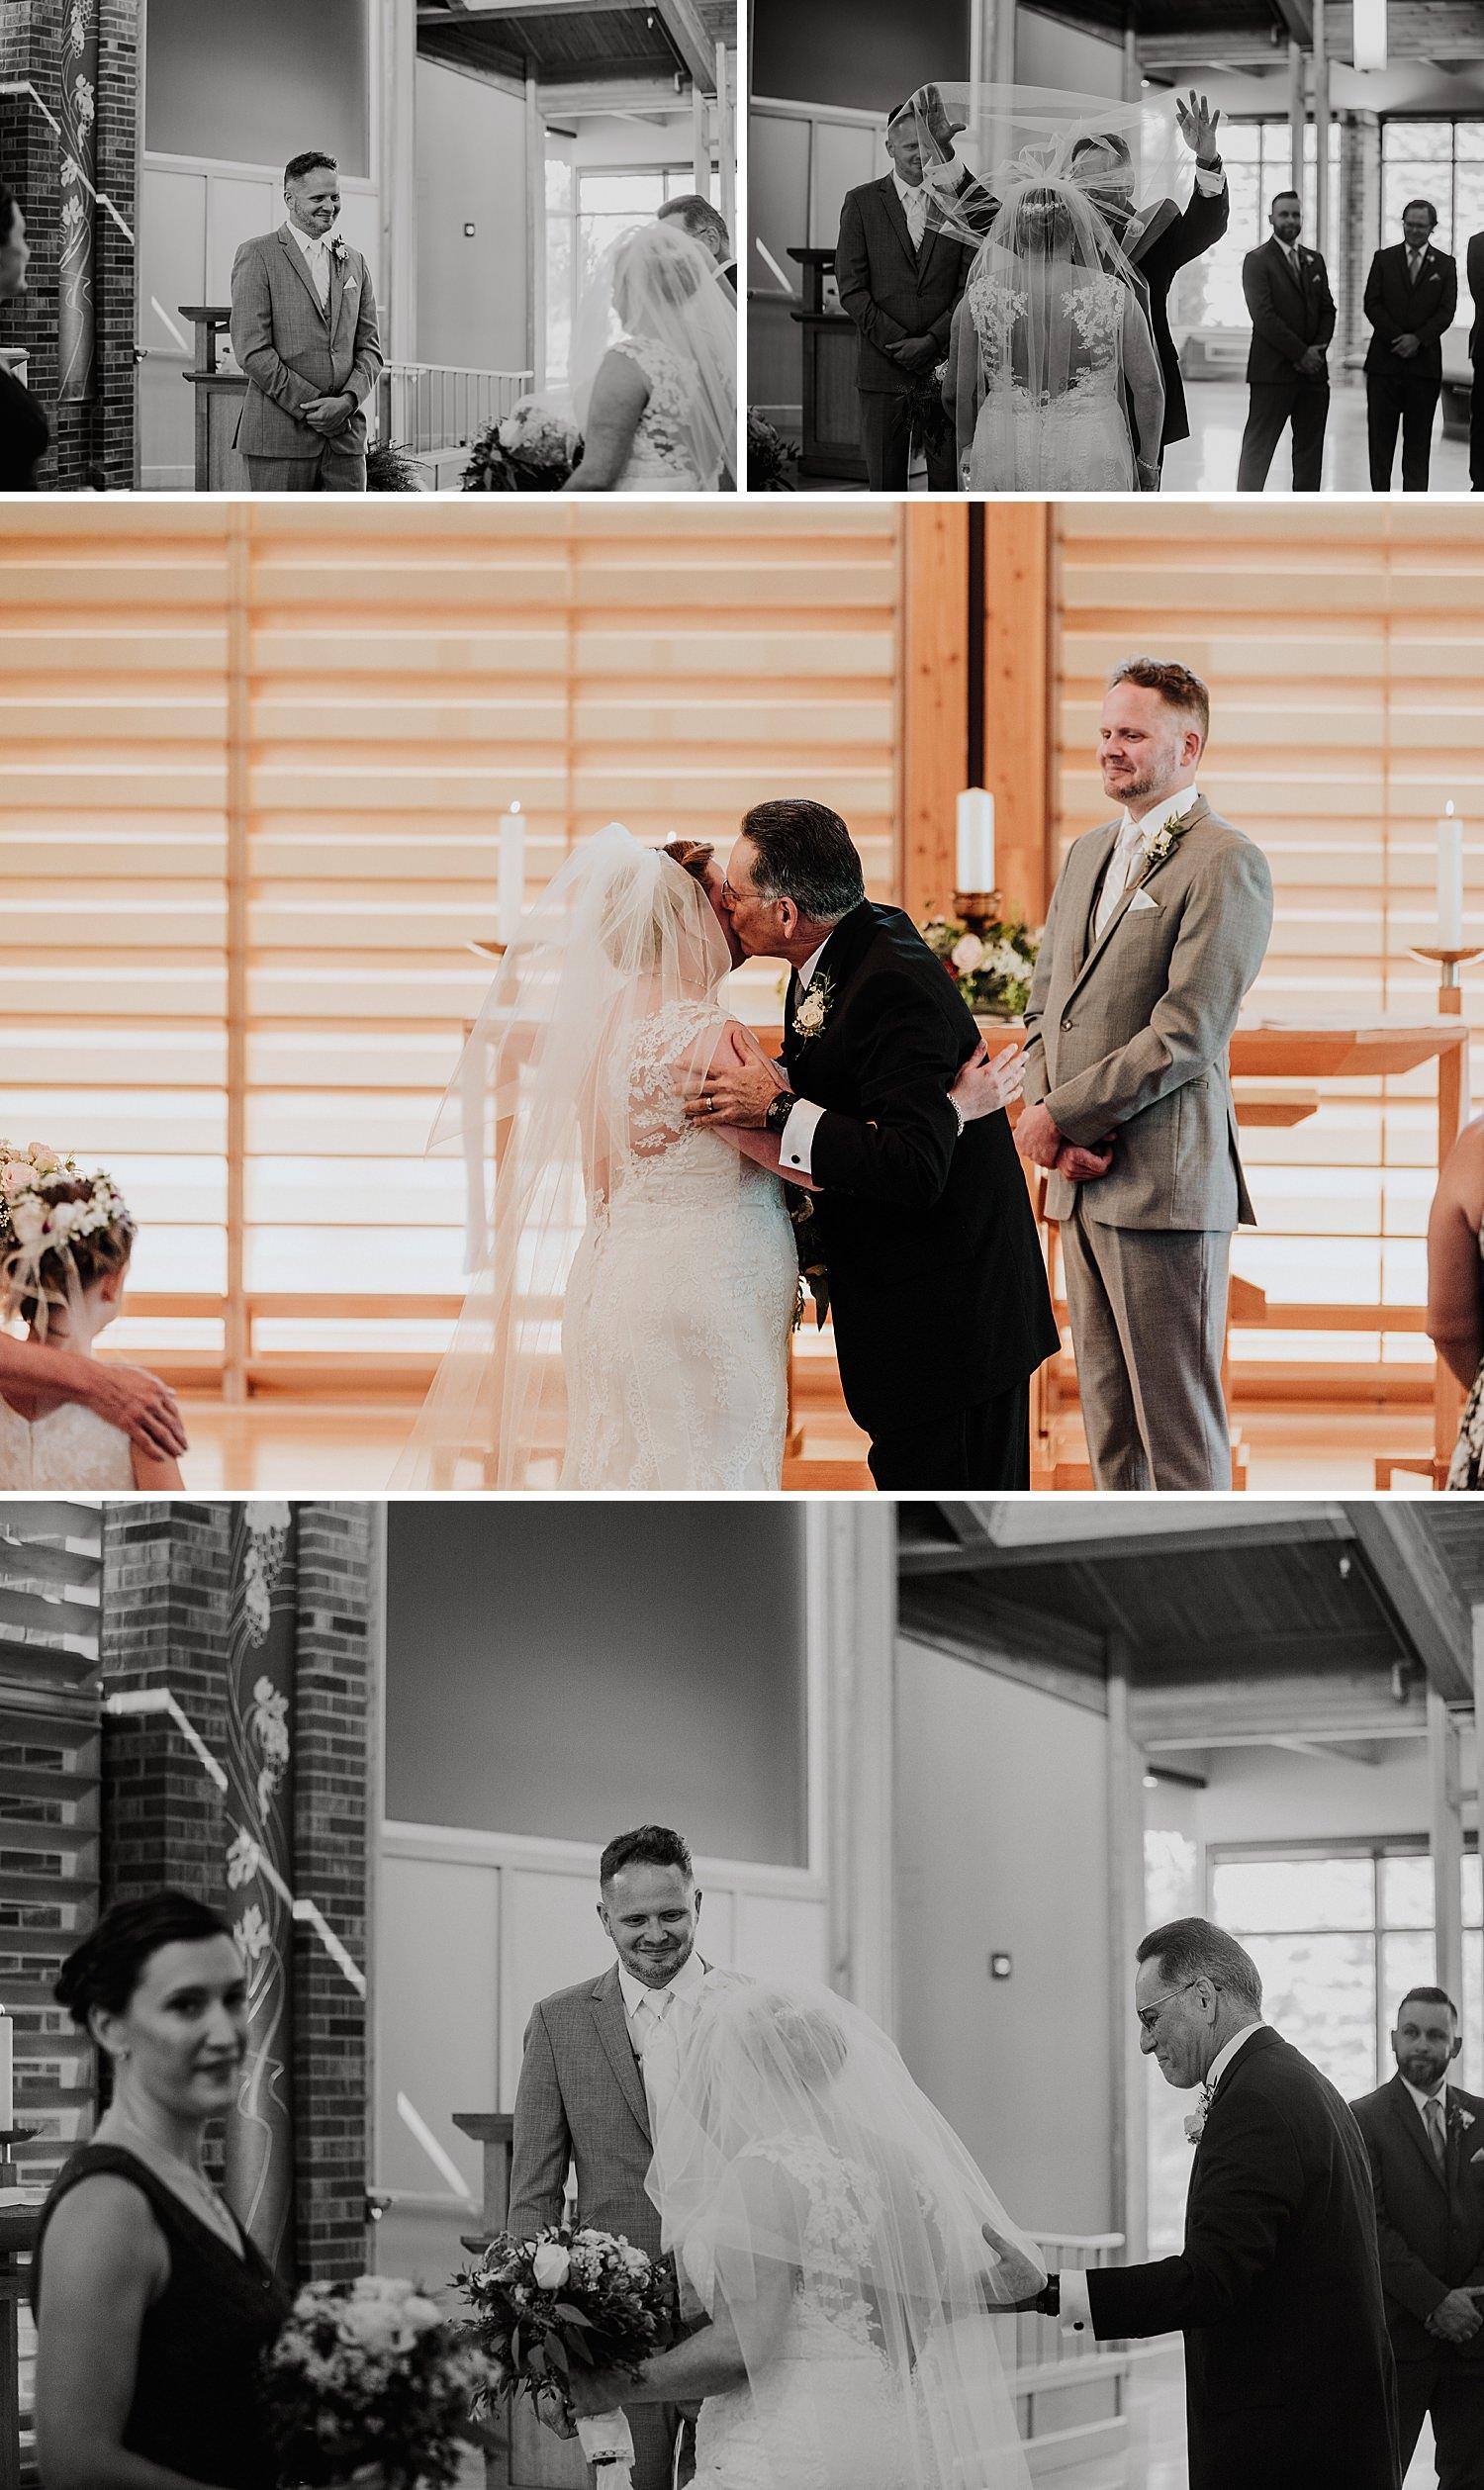 Terrace-167-Documentary-Wedding-Photographer_0009.jpg